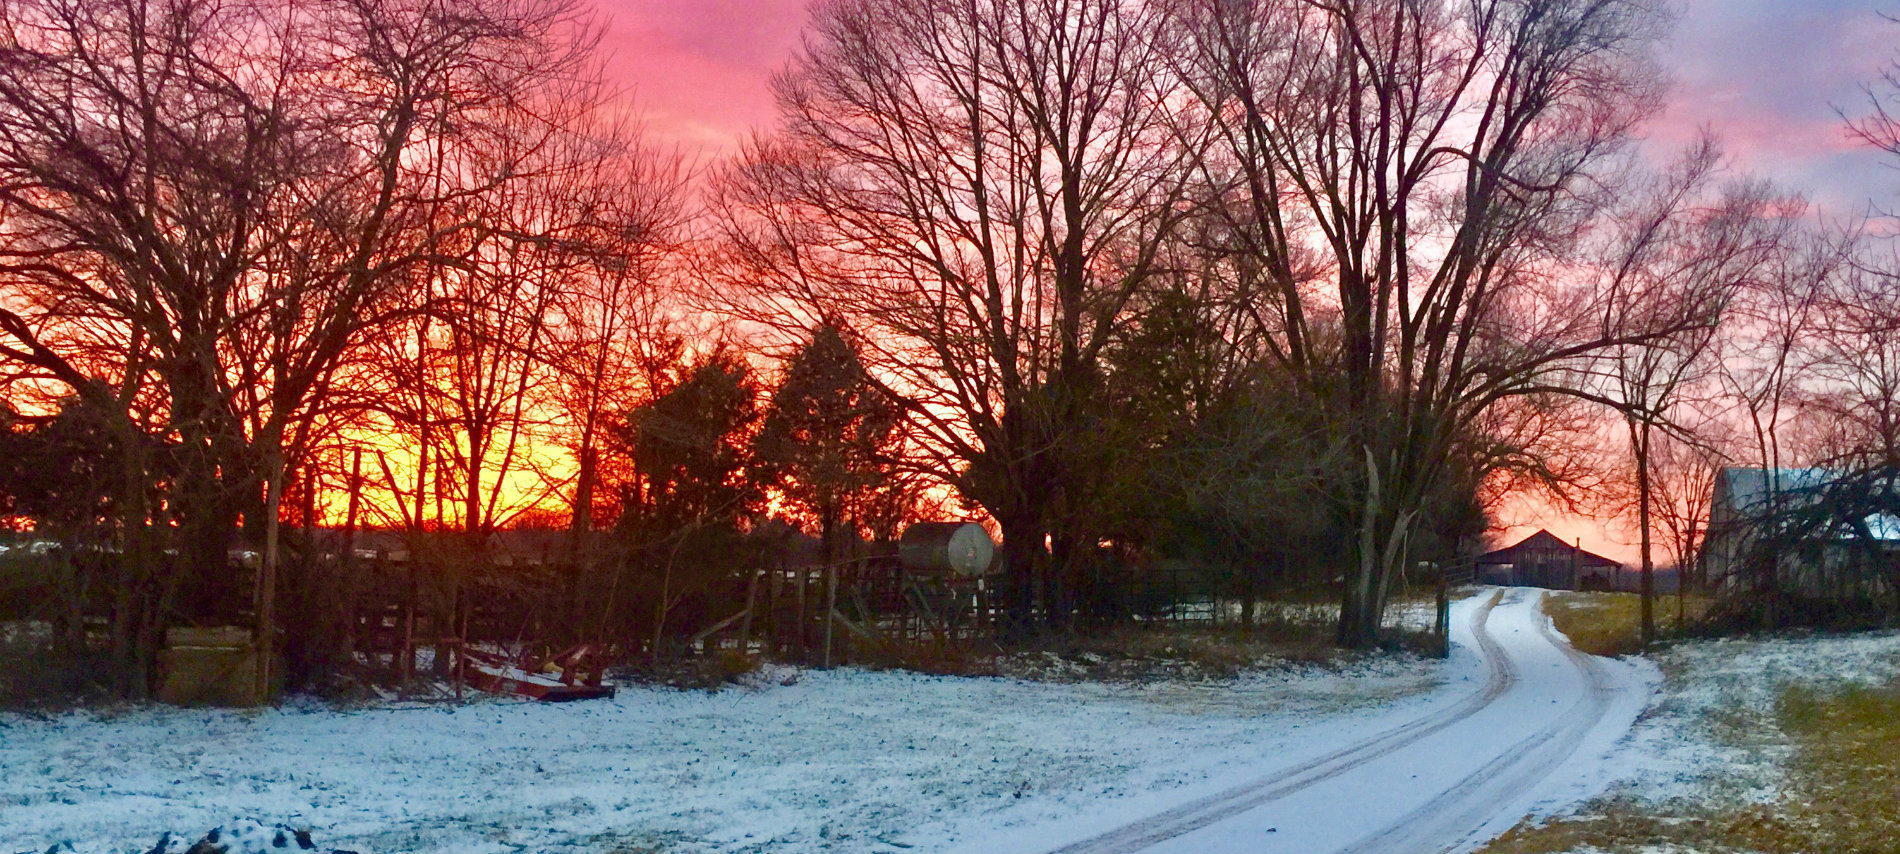 A winter scene in Caledonia. MO